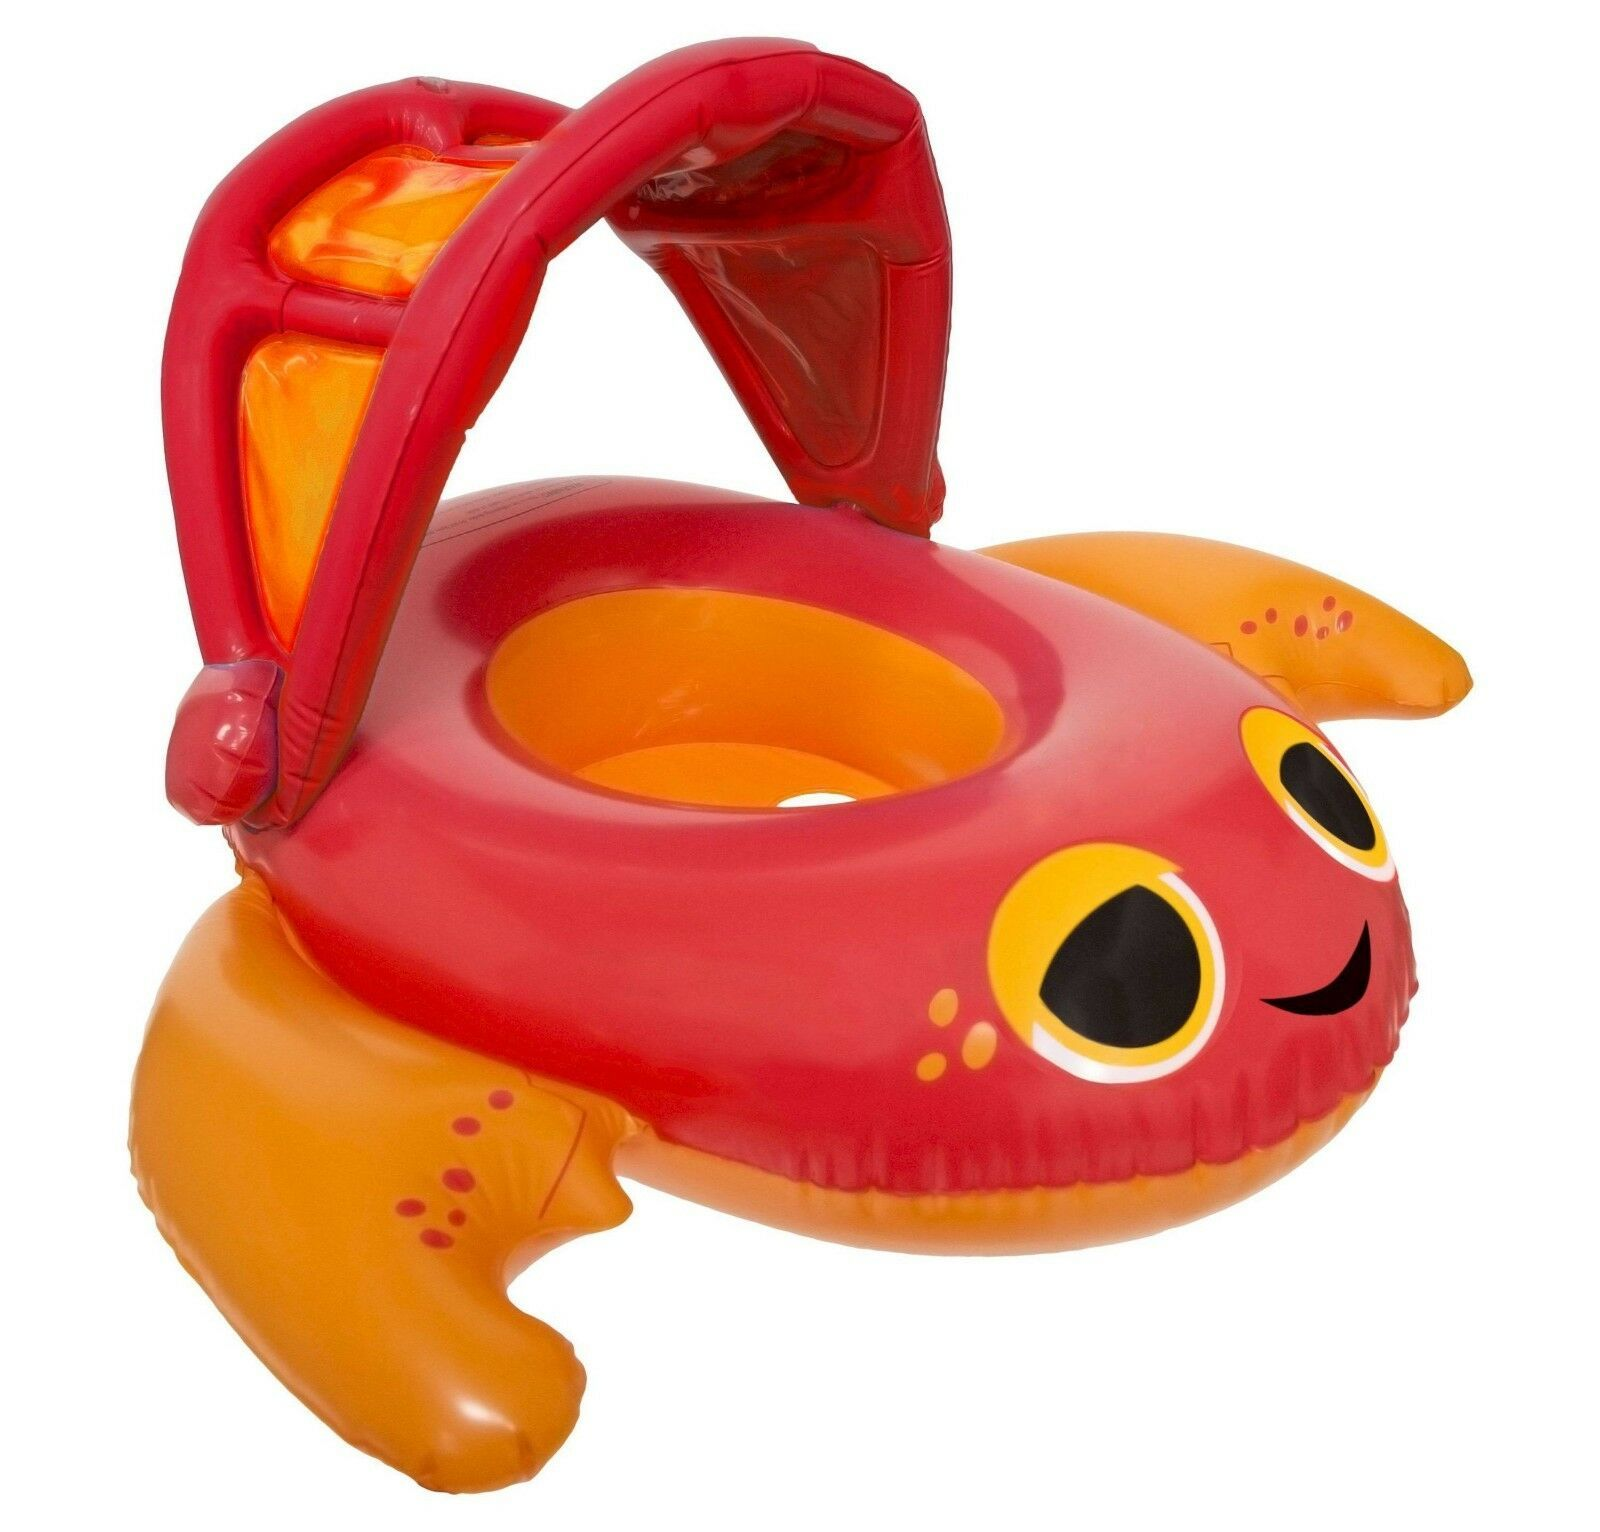 "Swim Ways 34"" Inflatable Sun Canopy Baby Boat Crab Float 9-24 months Step 1 NIB"